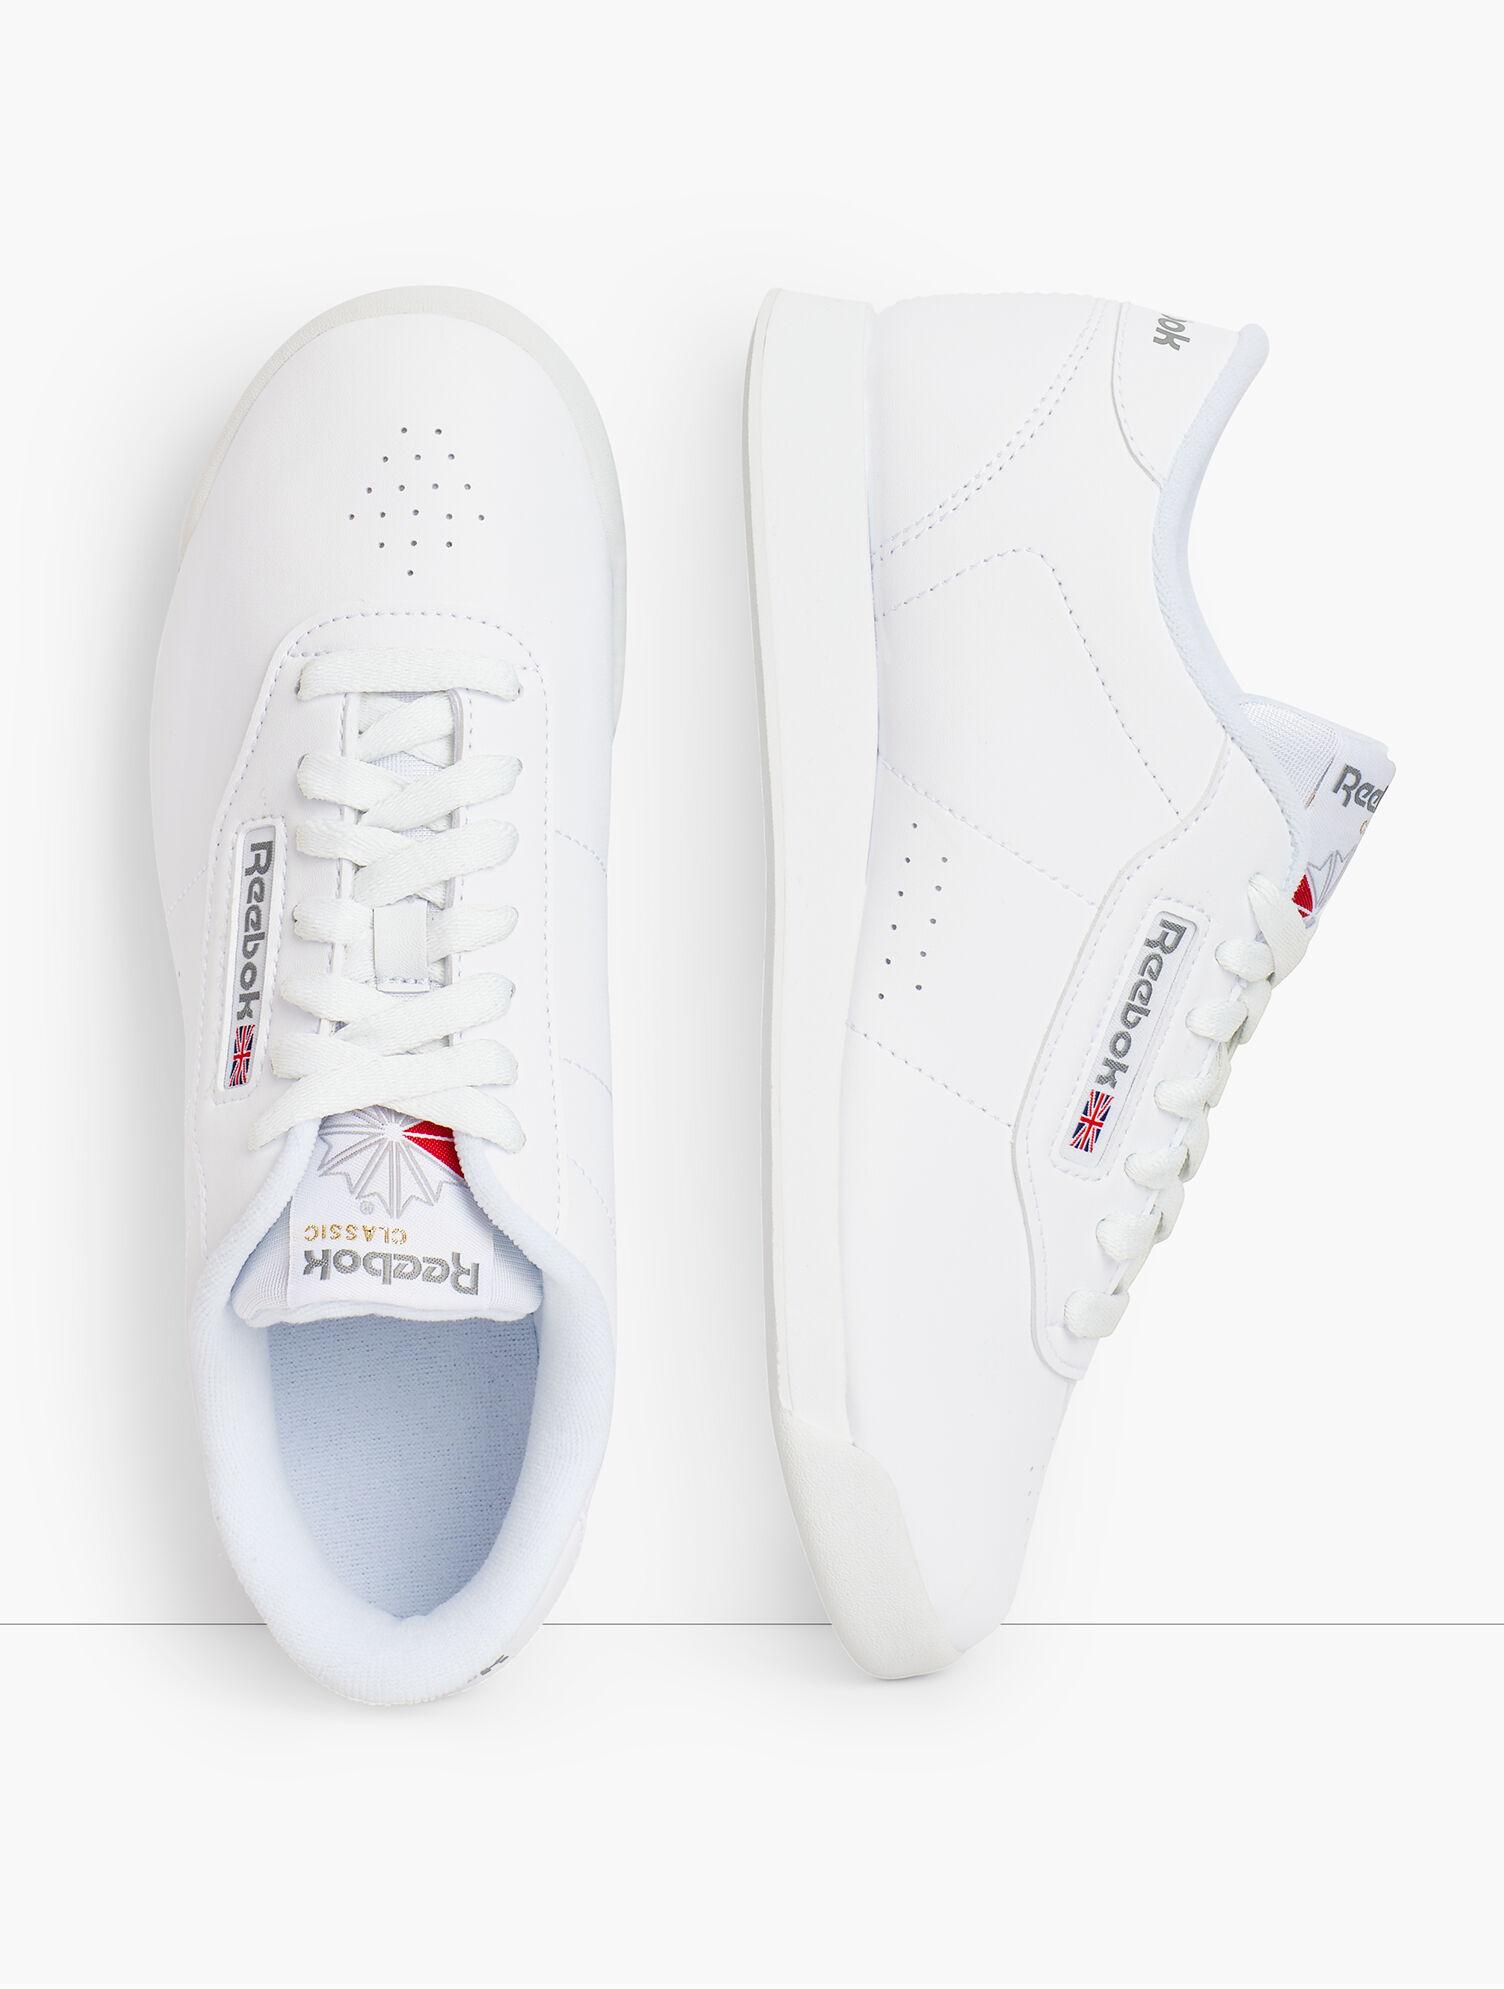 Reebok® Classic Princess Sneakers   Talbots